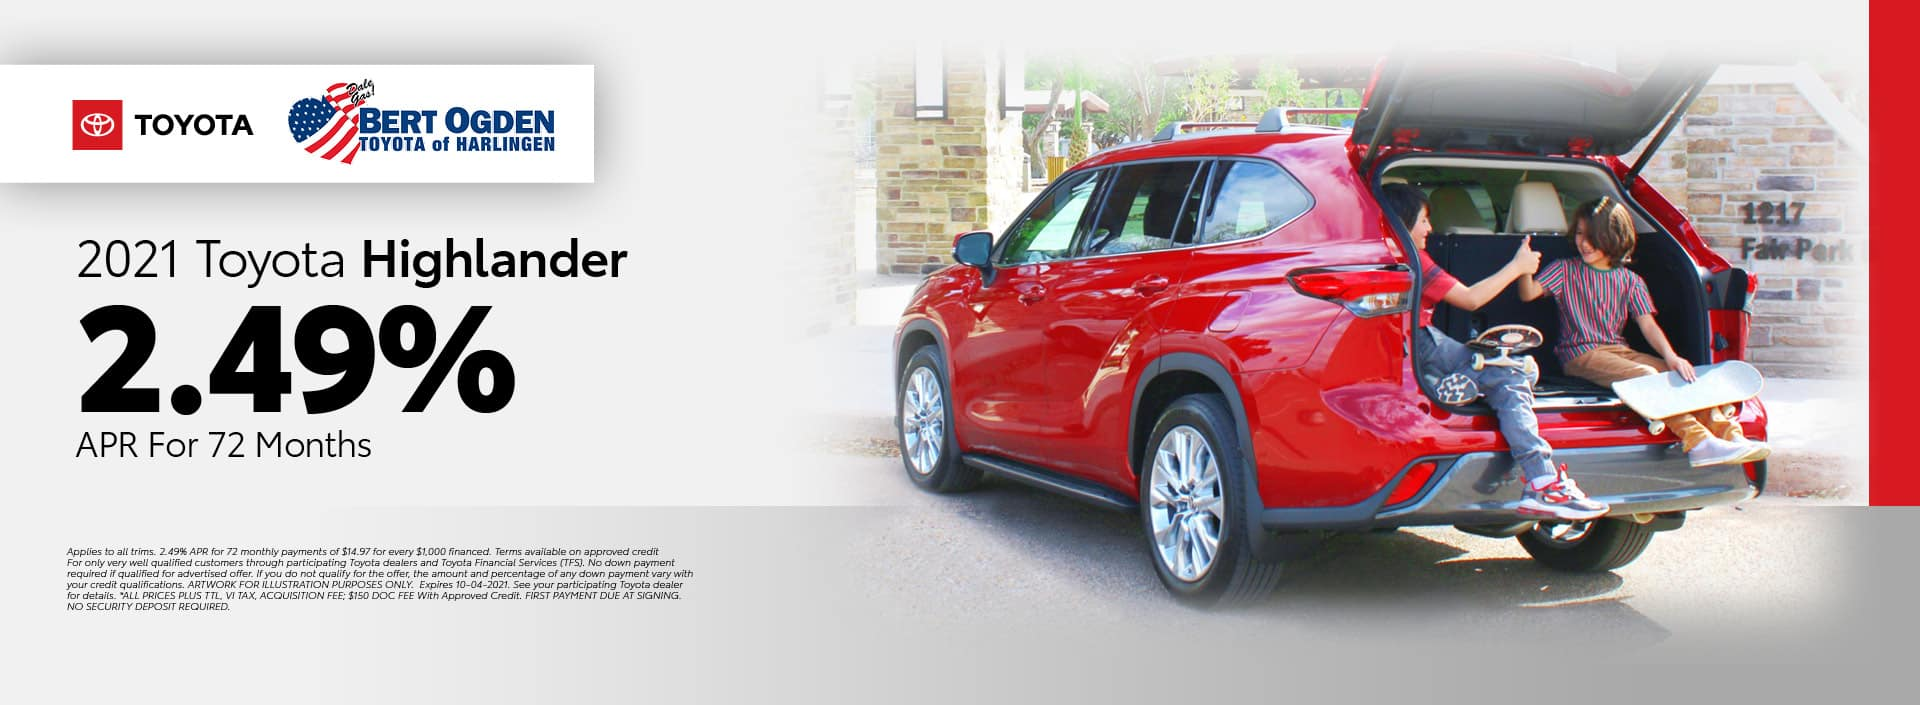 2021 Toyota Highlander APR Offer | Bert Ogden Toyota in Harlingen, Texas